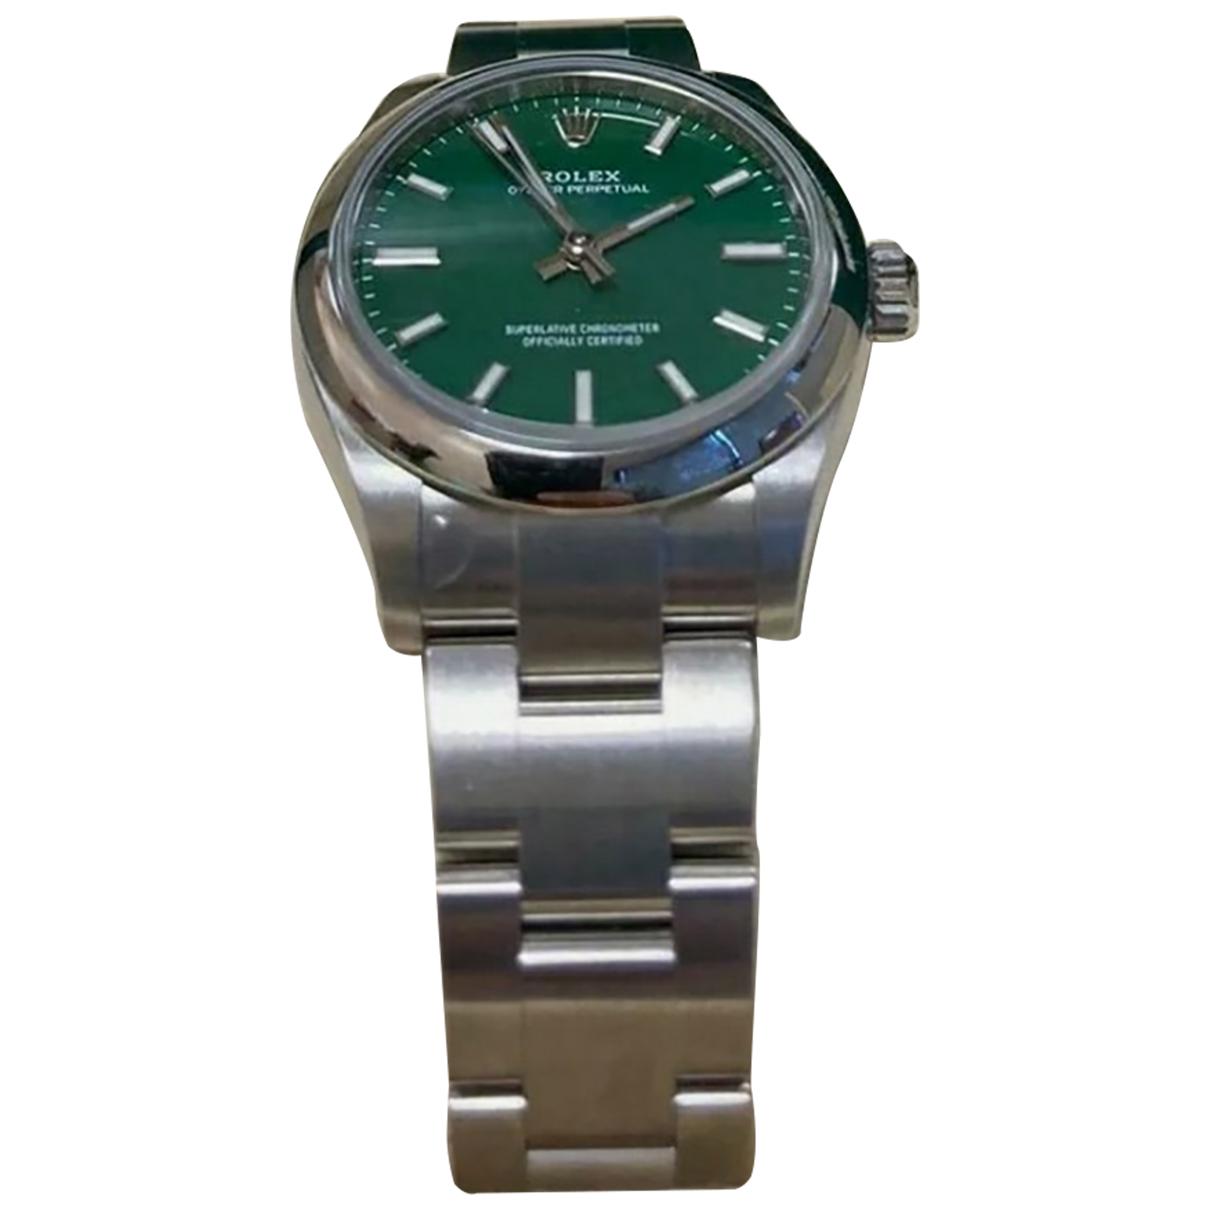 Rolex Oyster Perpetual 31mm Uhr in  Gruen Stahl